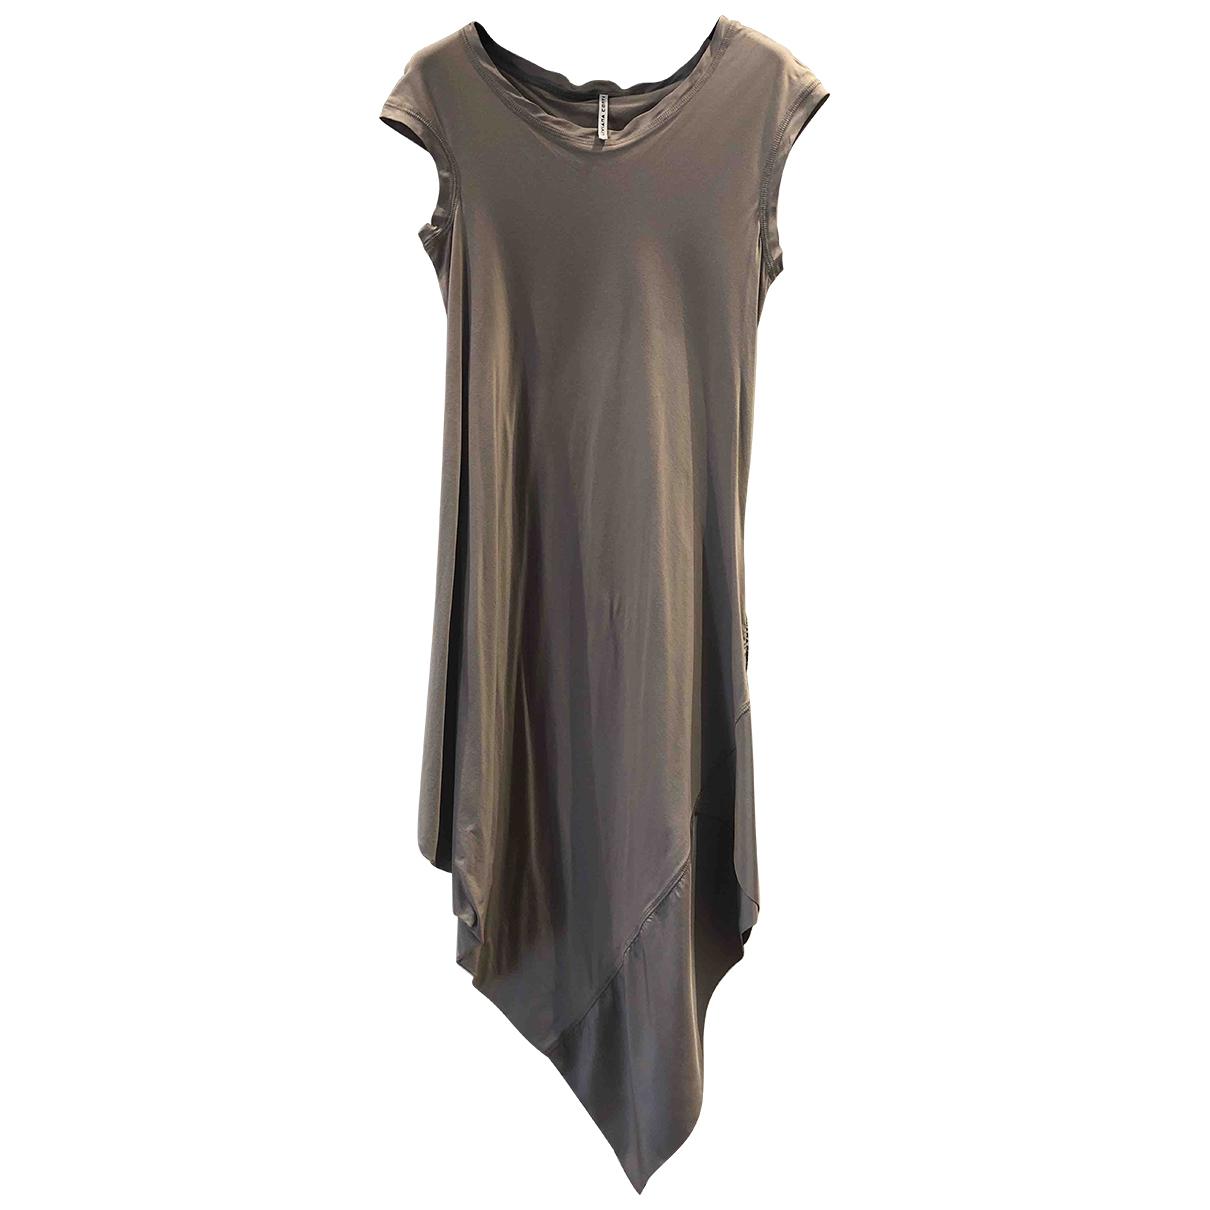 Liviana Conti \N Cotton - elasthane dress for Women 42 IT